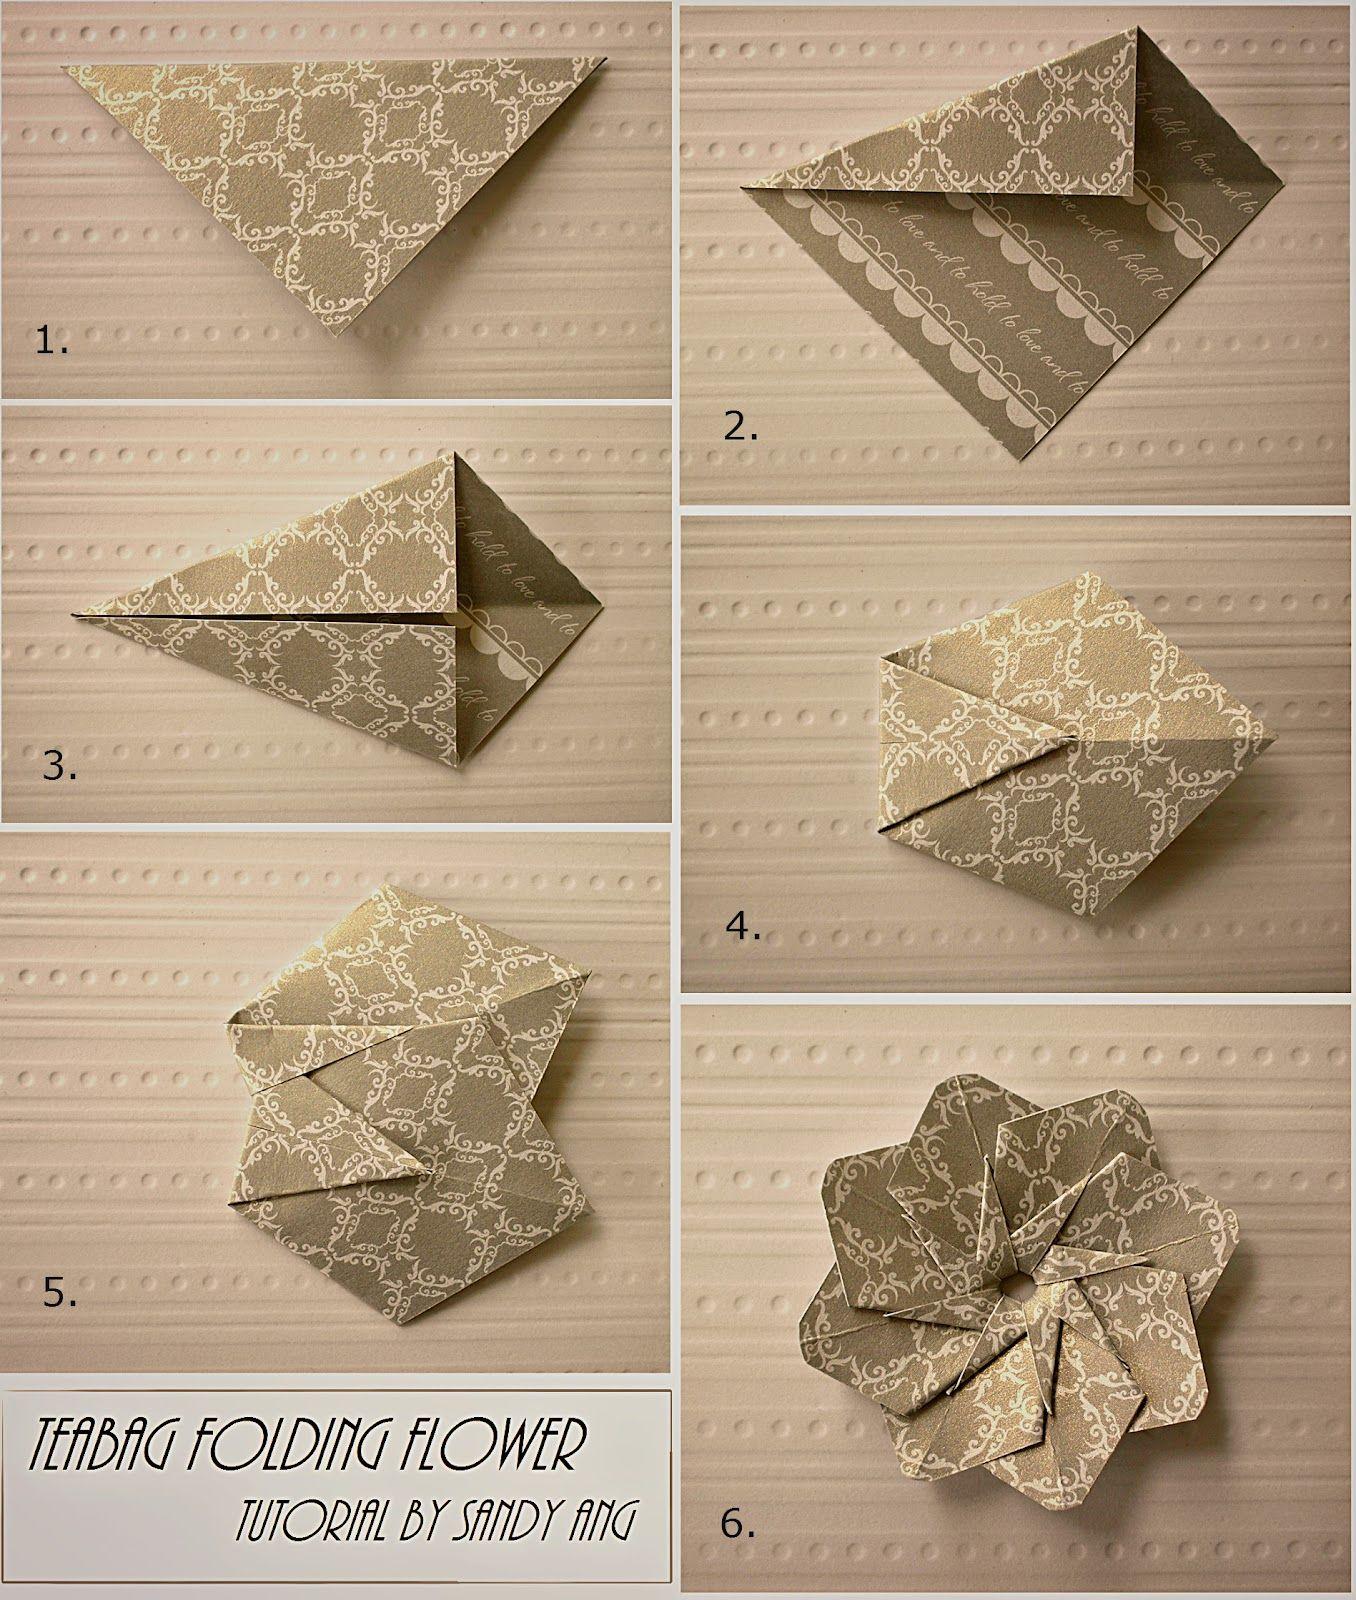 Pin By Florencia On Para La Escuela Origami Paper Art Origami